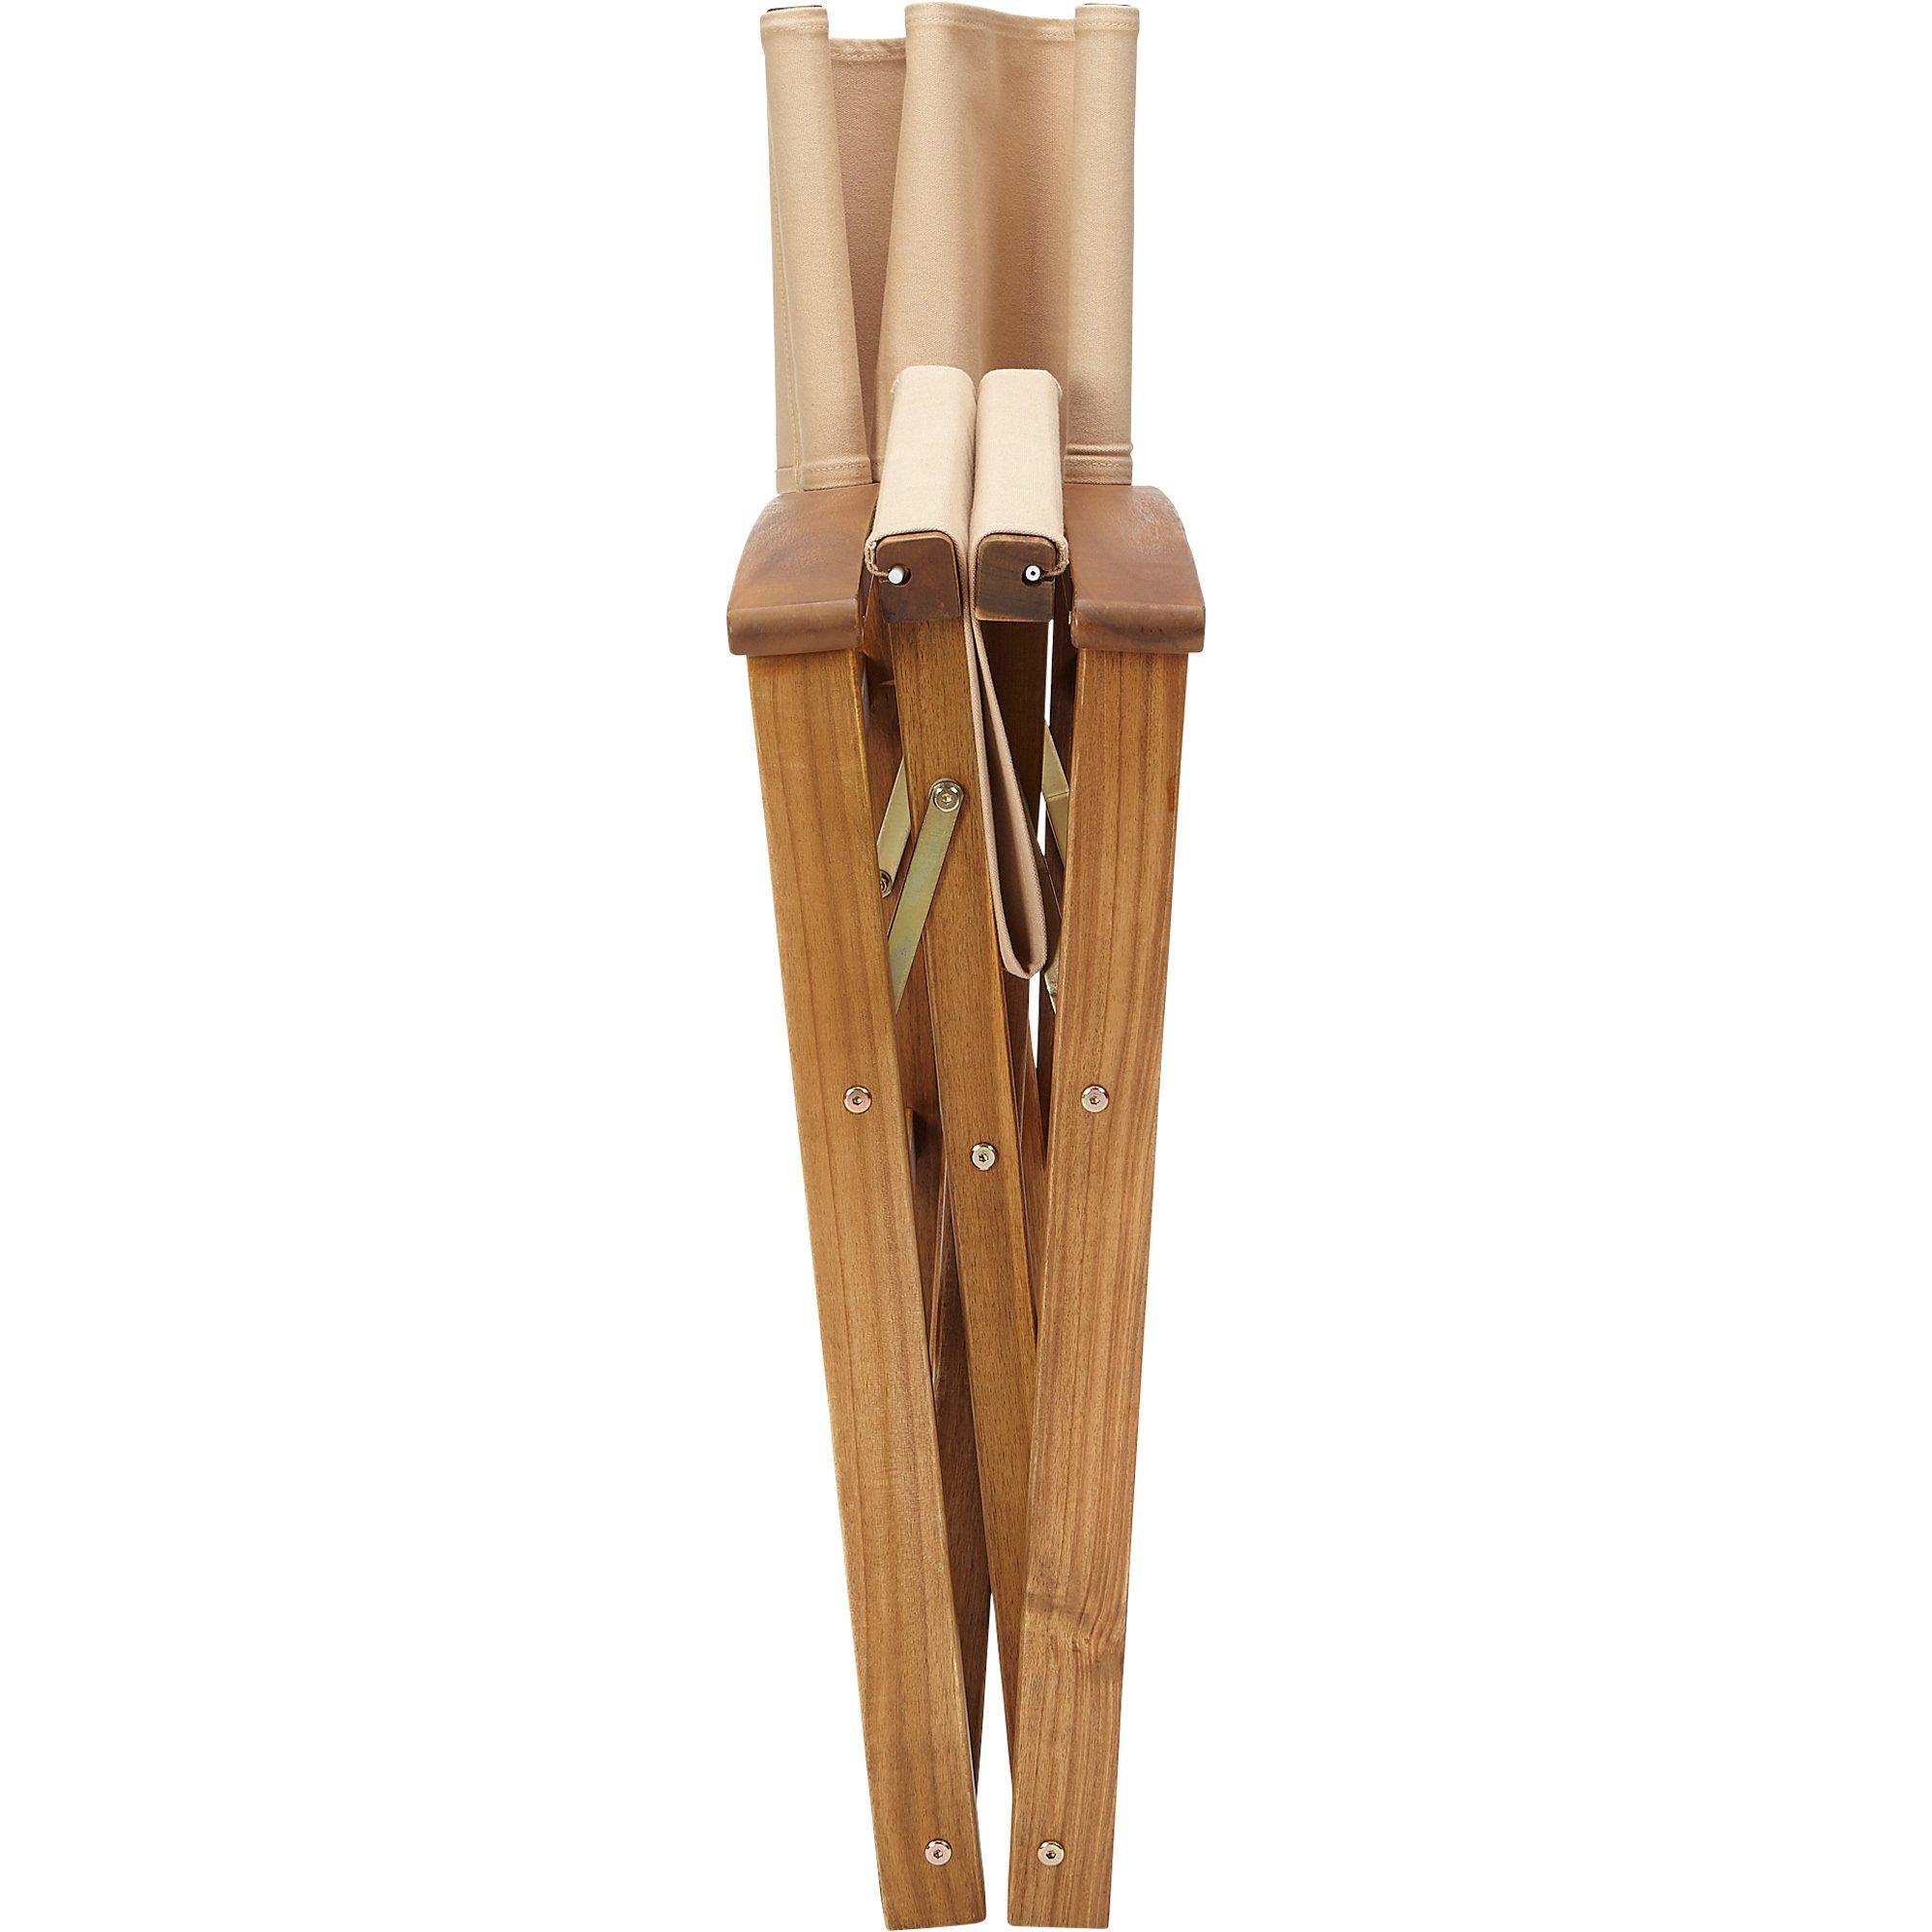 Acacia Wood Folding Director's Chair - Natural